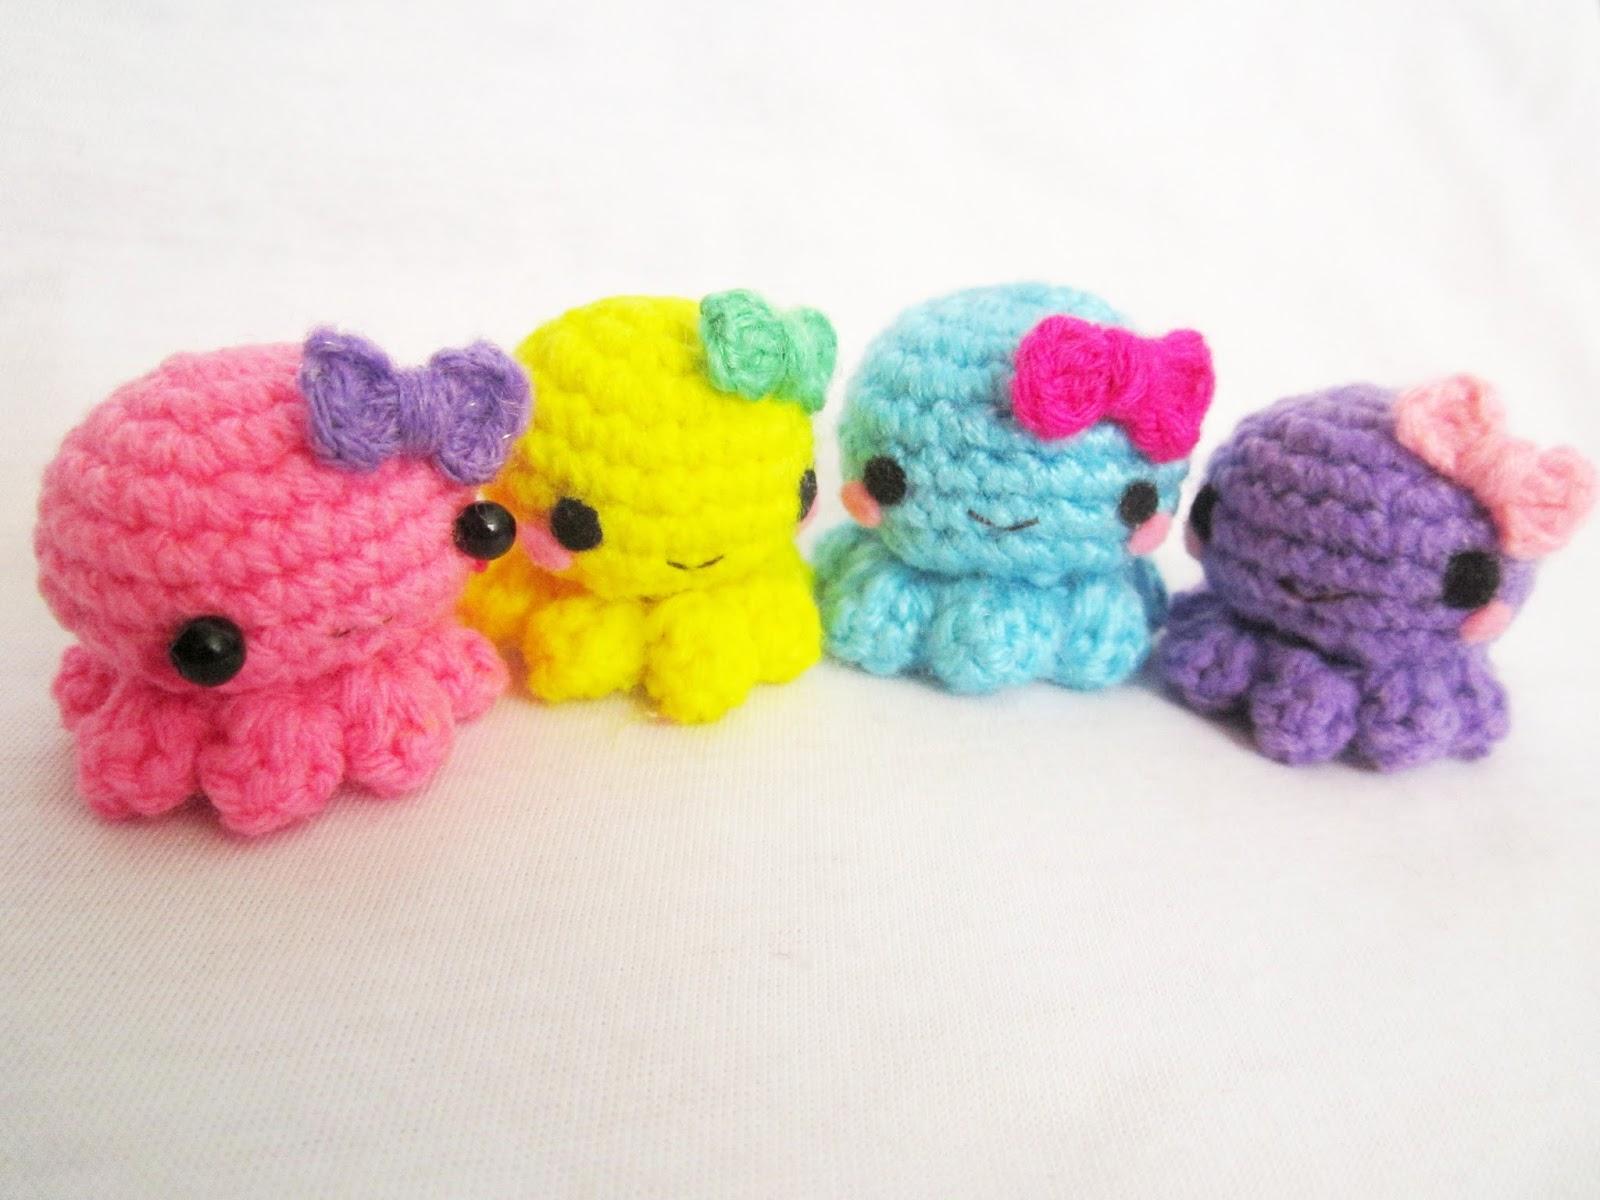 Baby octopus amigurumi - A little love everyday!